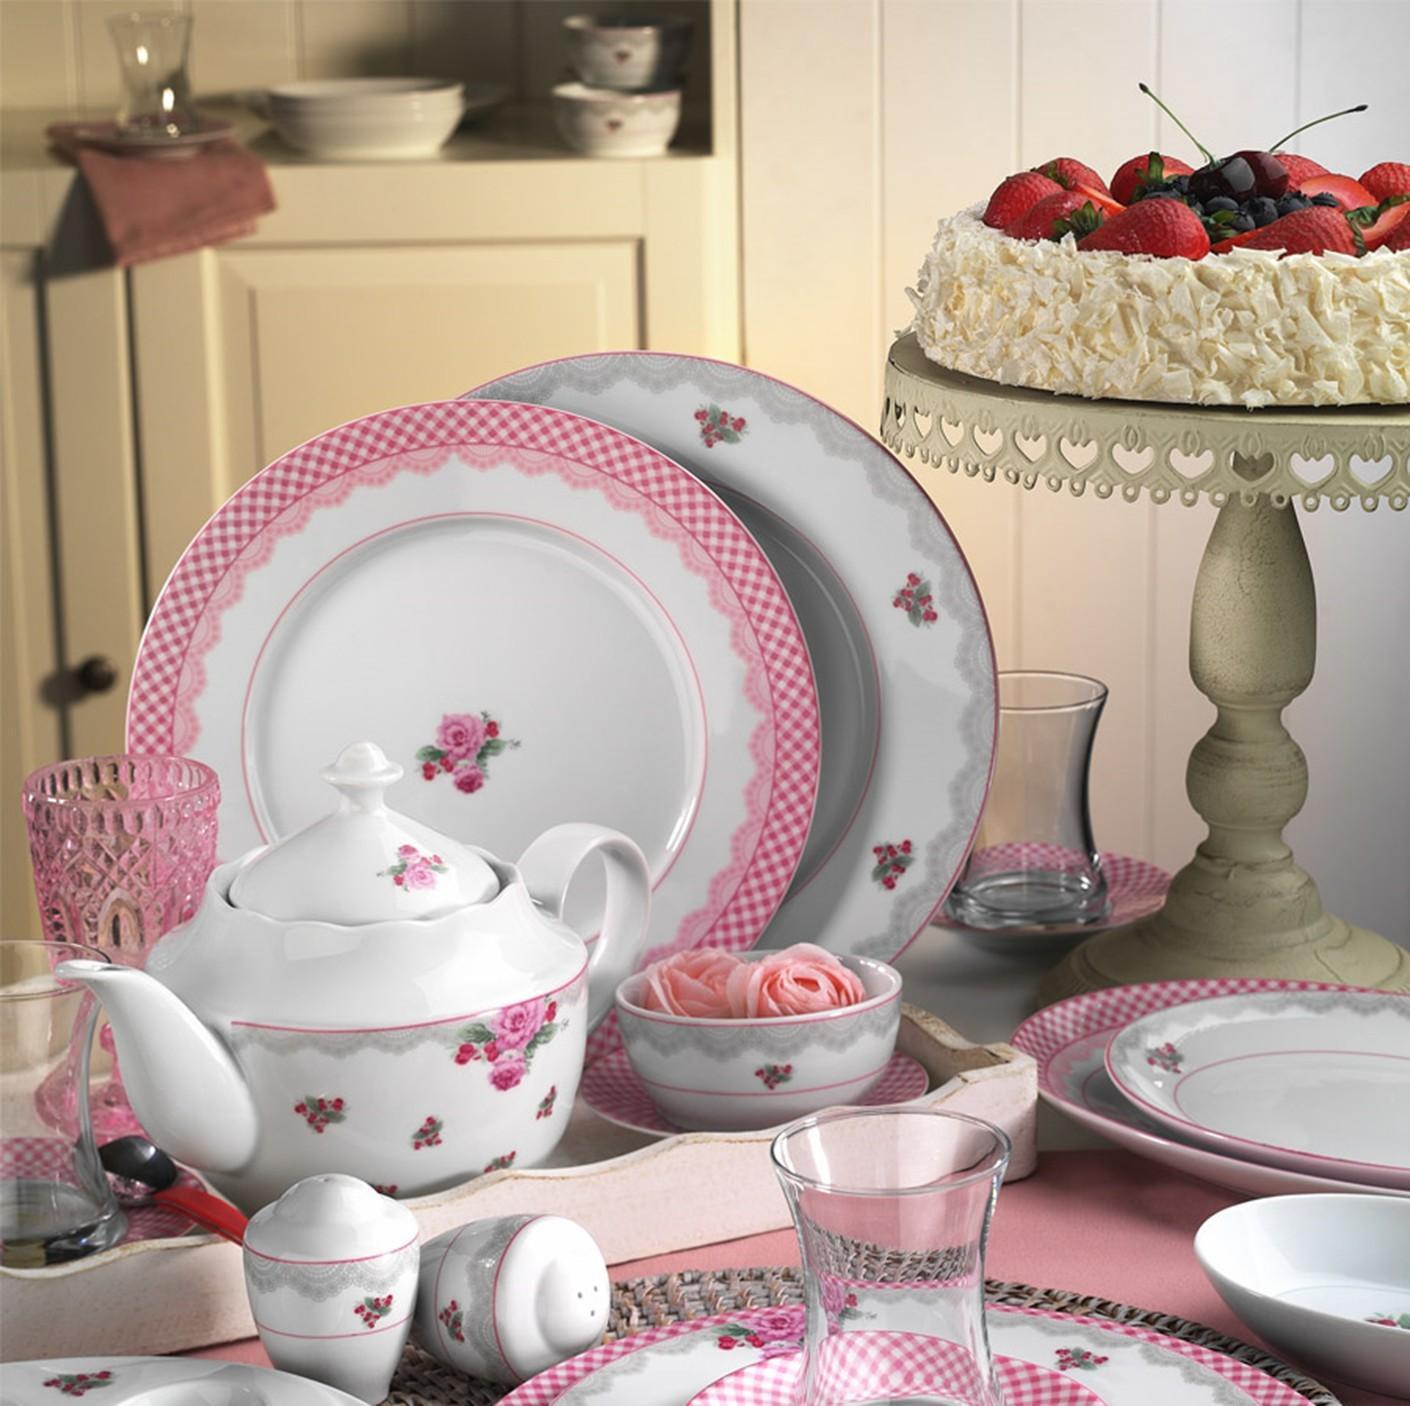 Kutahya Porselen LEONGBERG 43 Pieces 8537 Patterned Dinnerware Set